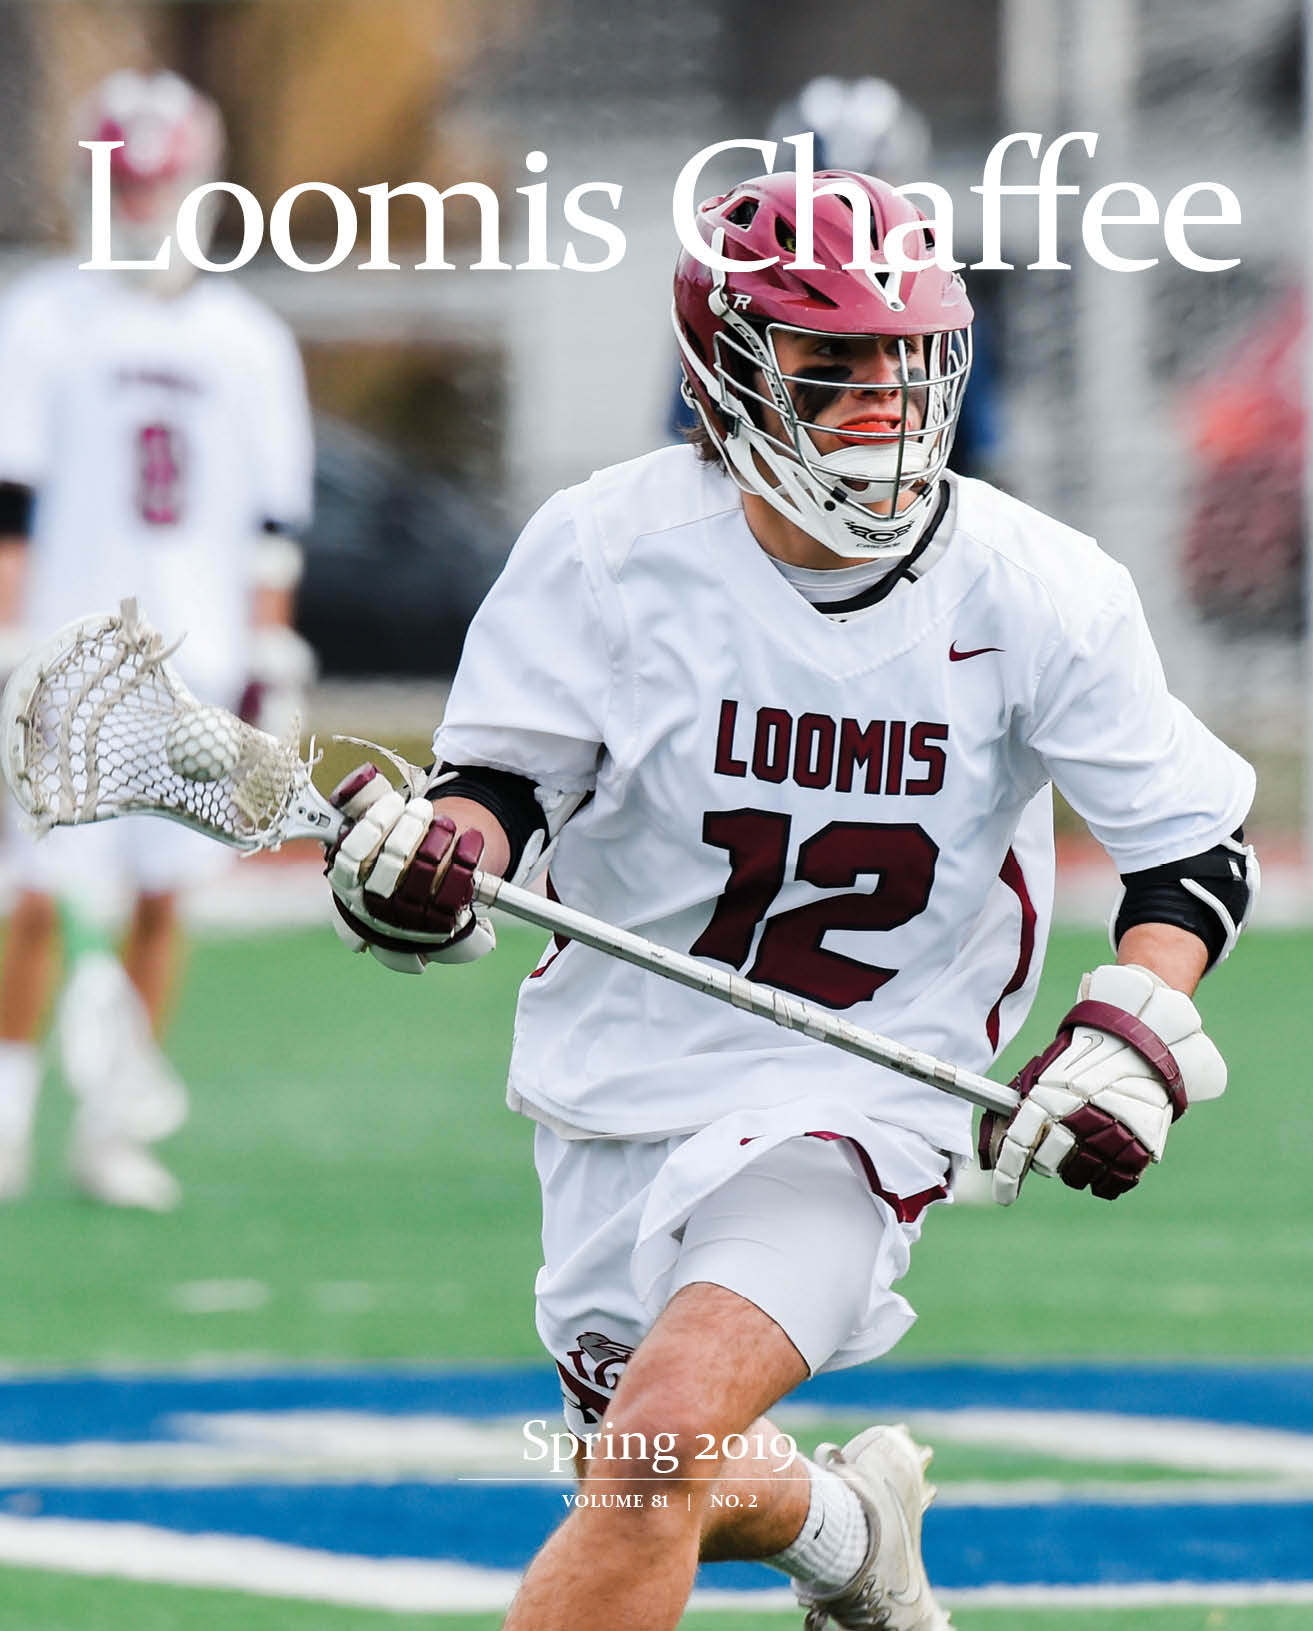 Loomis Chaffee Magazine Spring 2019